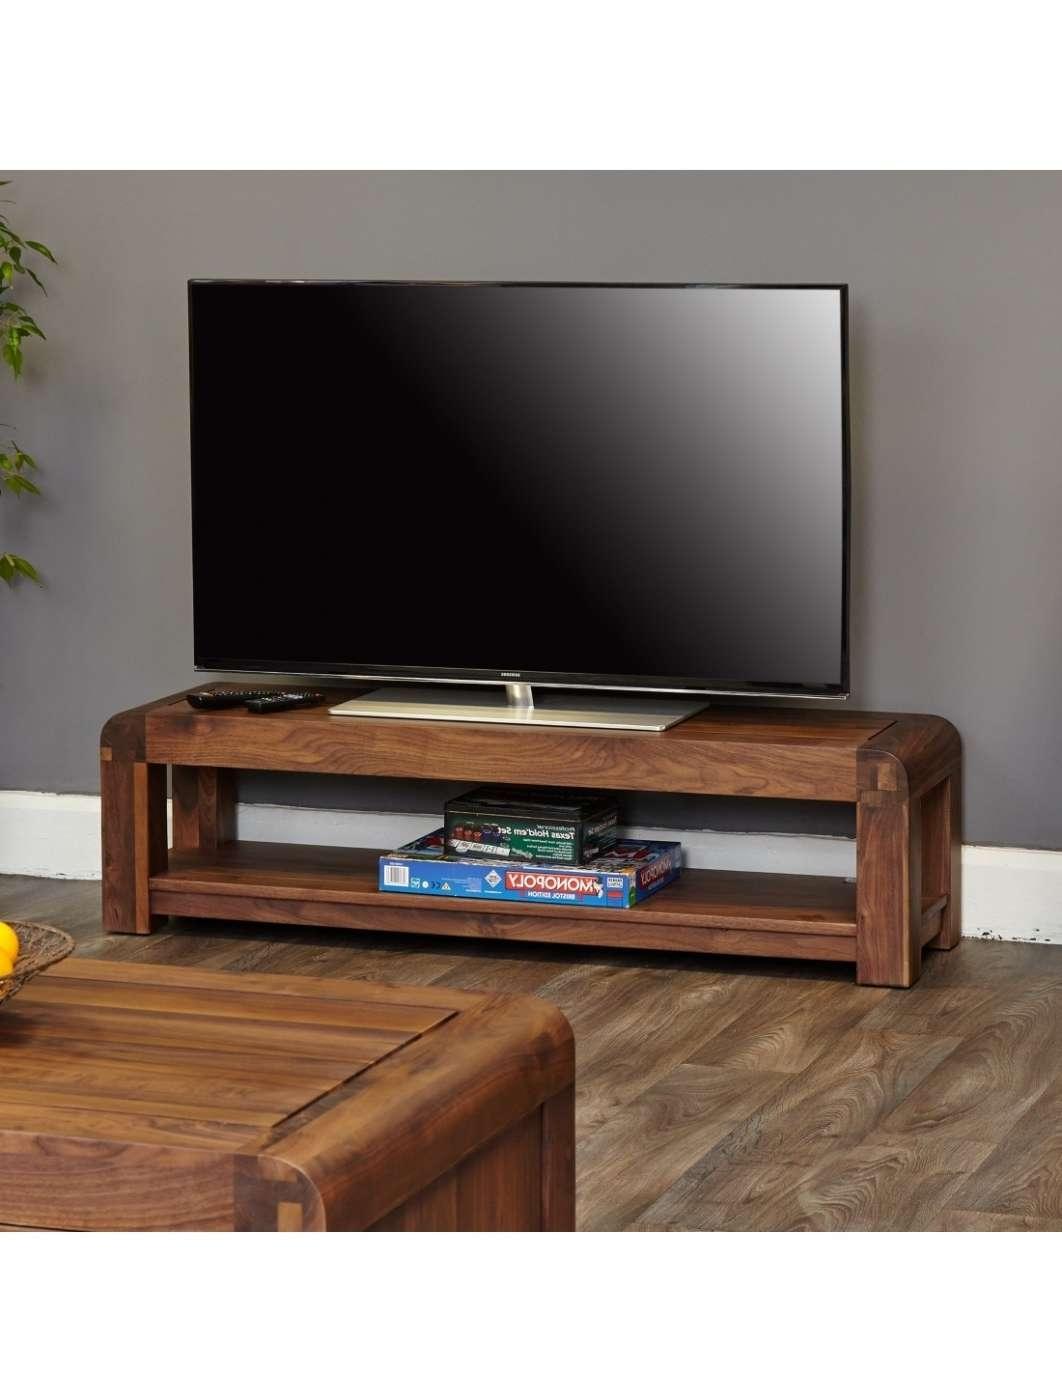 Low Widescreen Tv Stand Baumhaus Shiro Walnut Cdr09A | 121 Tv Mounts For Widescreen Tv Stands (View 7 of 15)